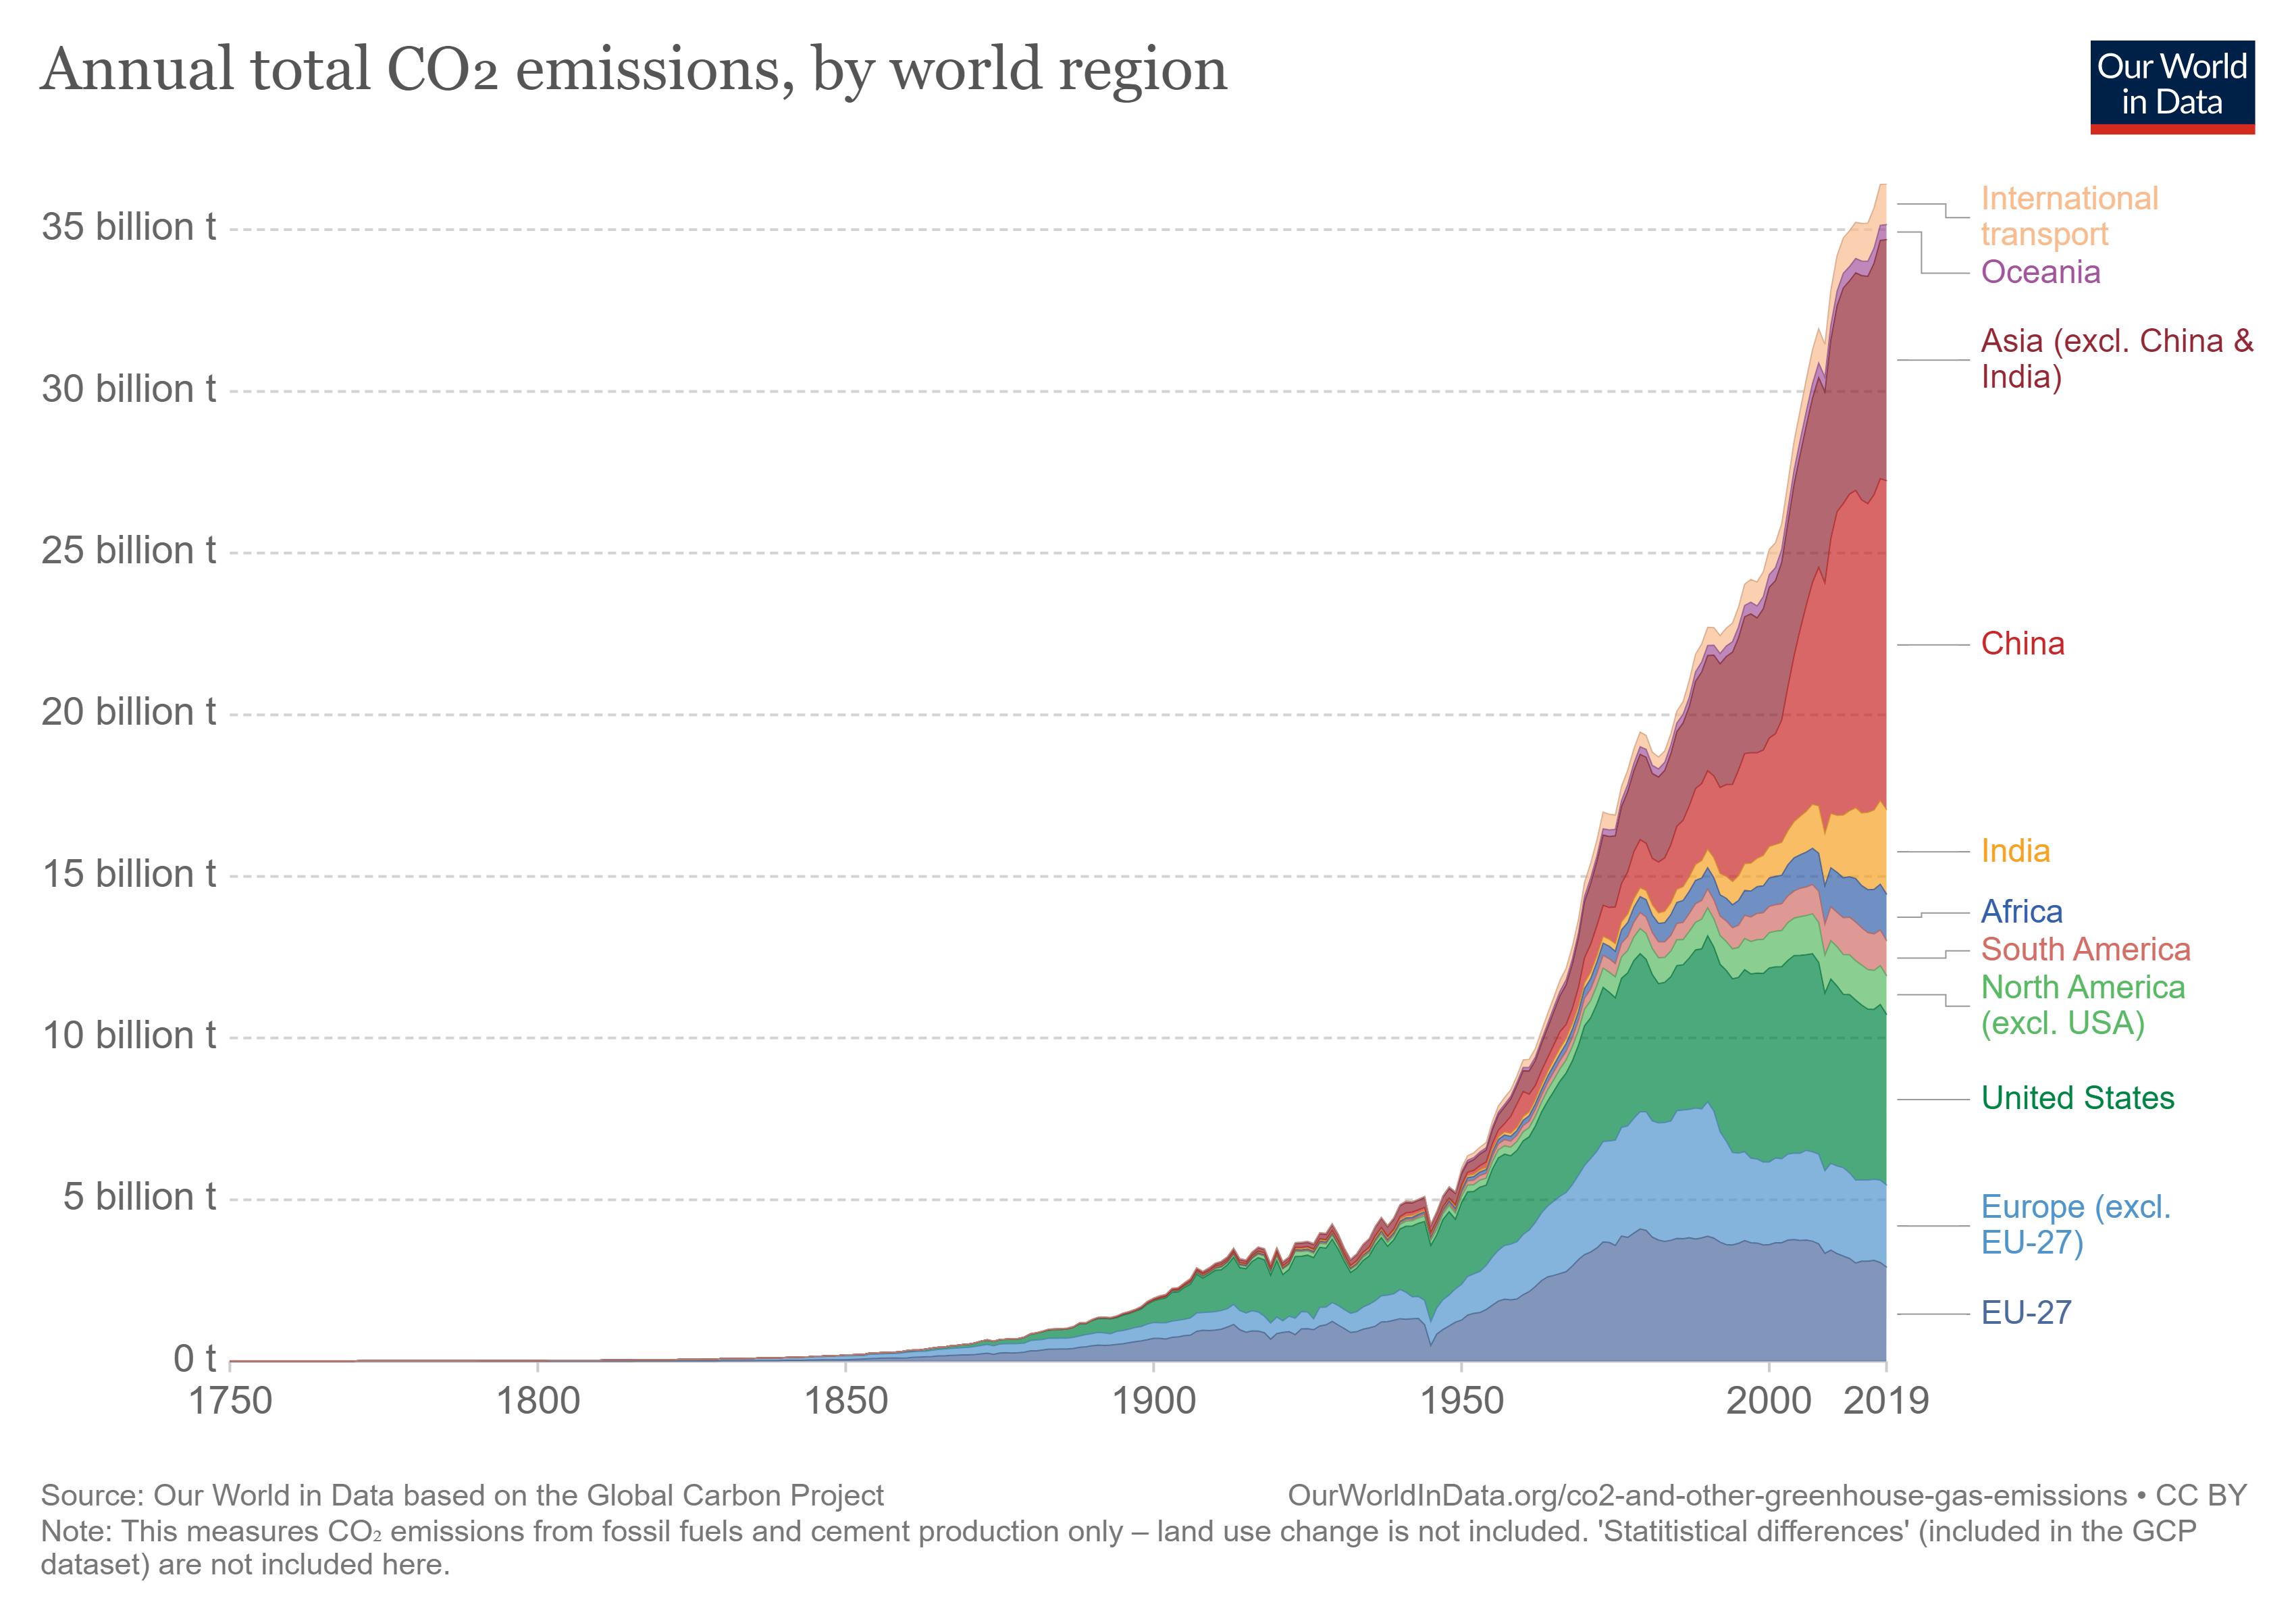 The breakdown of global CO2 emissions by region